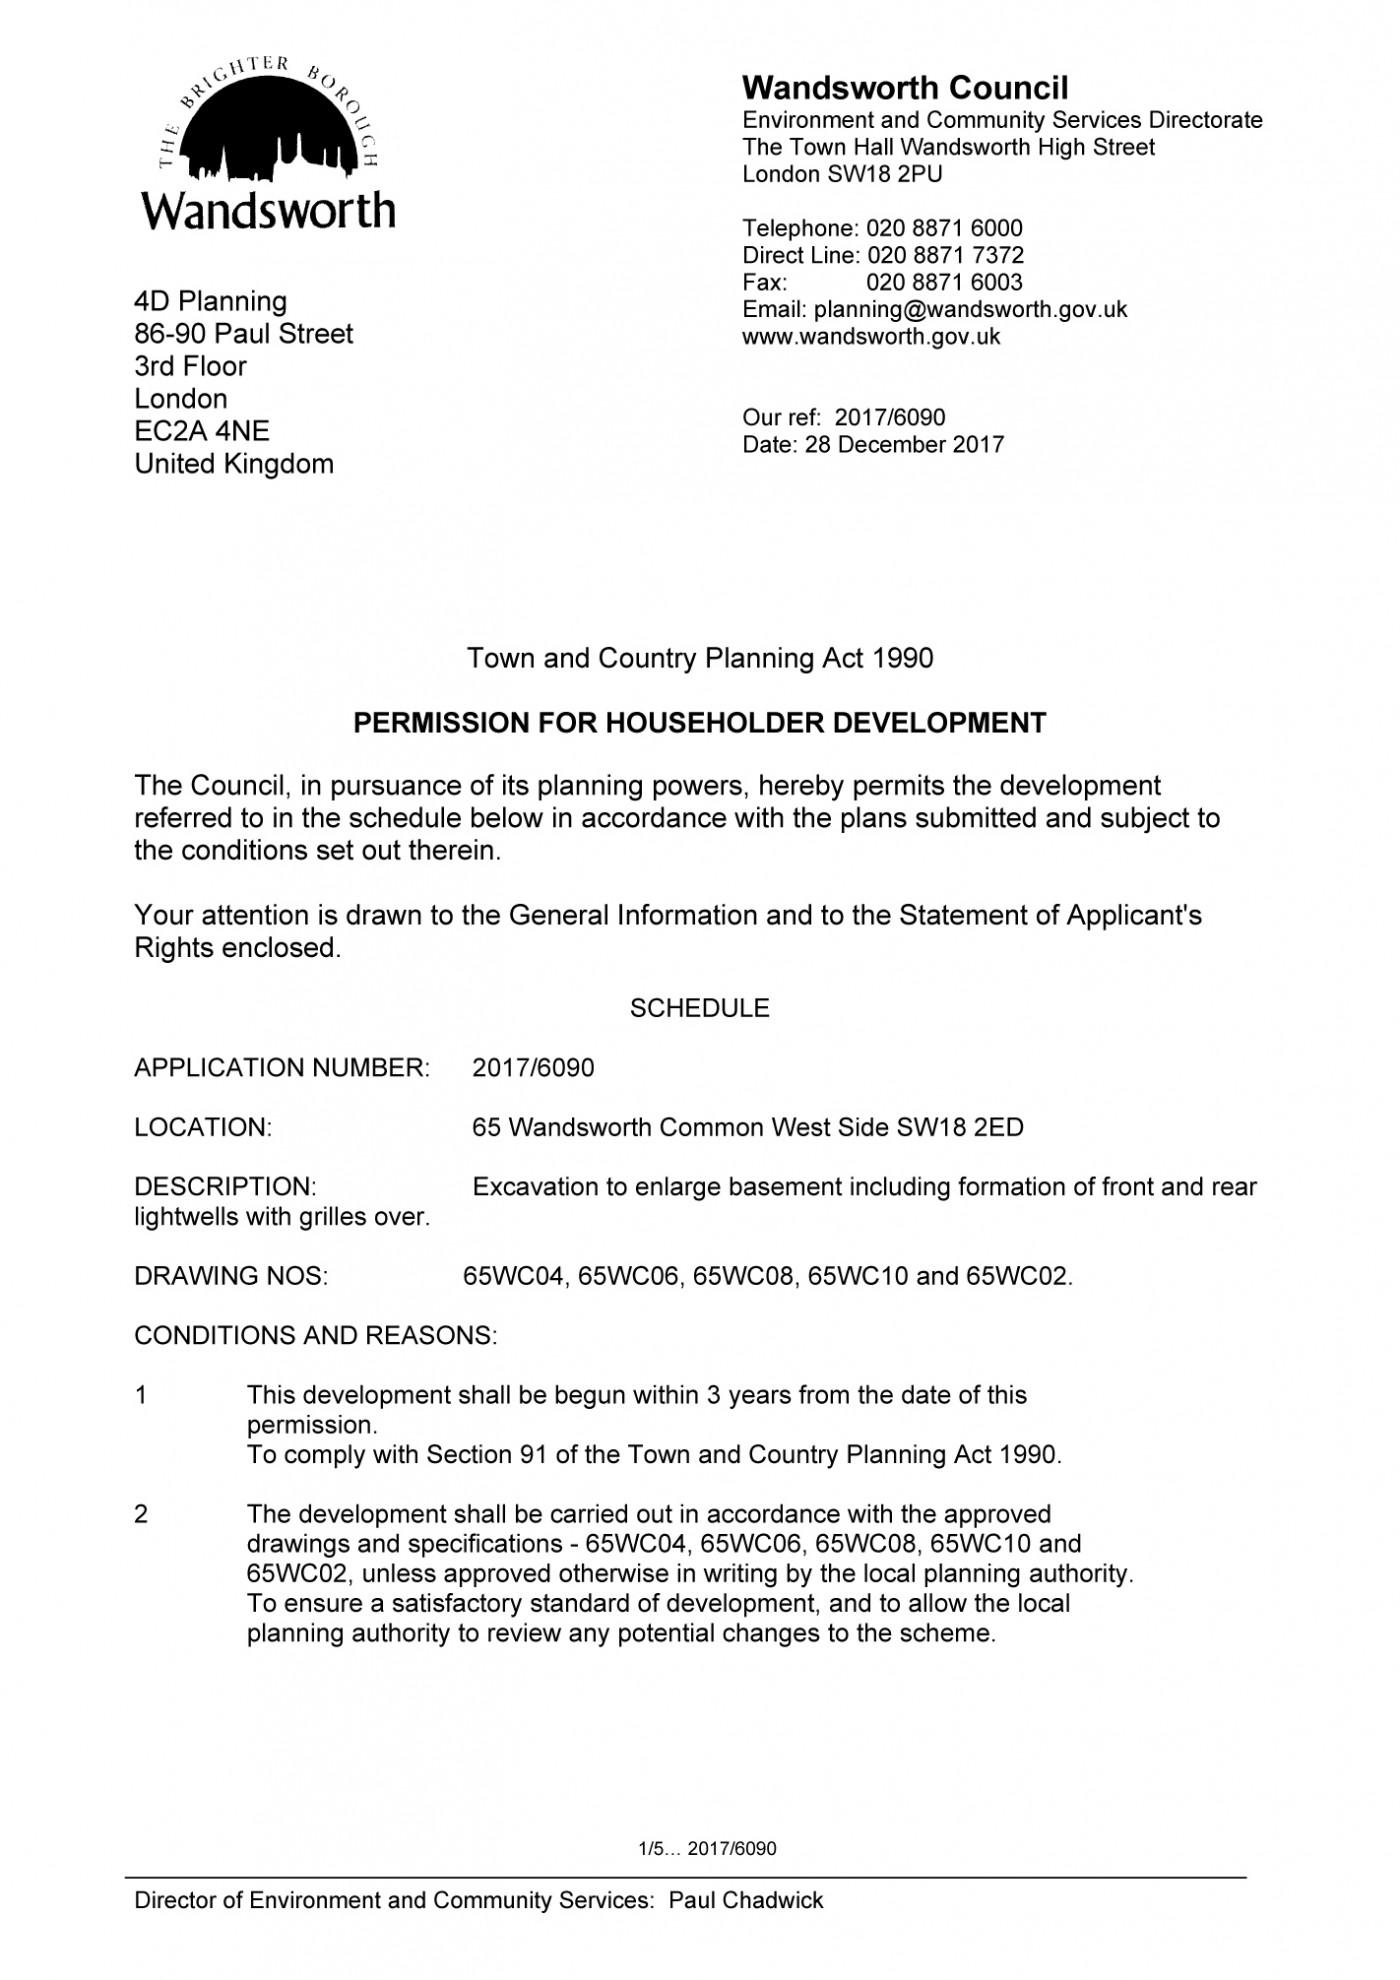 decision notice - Wandsworth Council